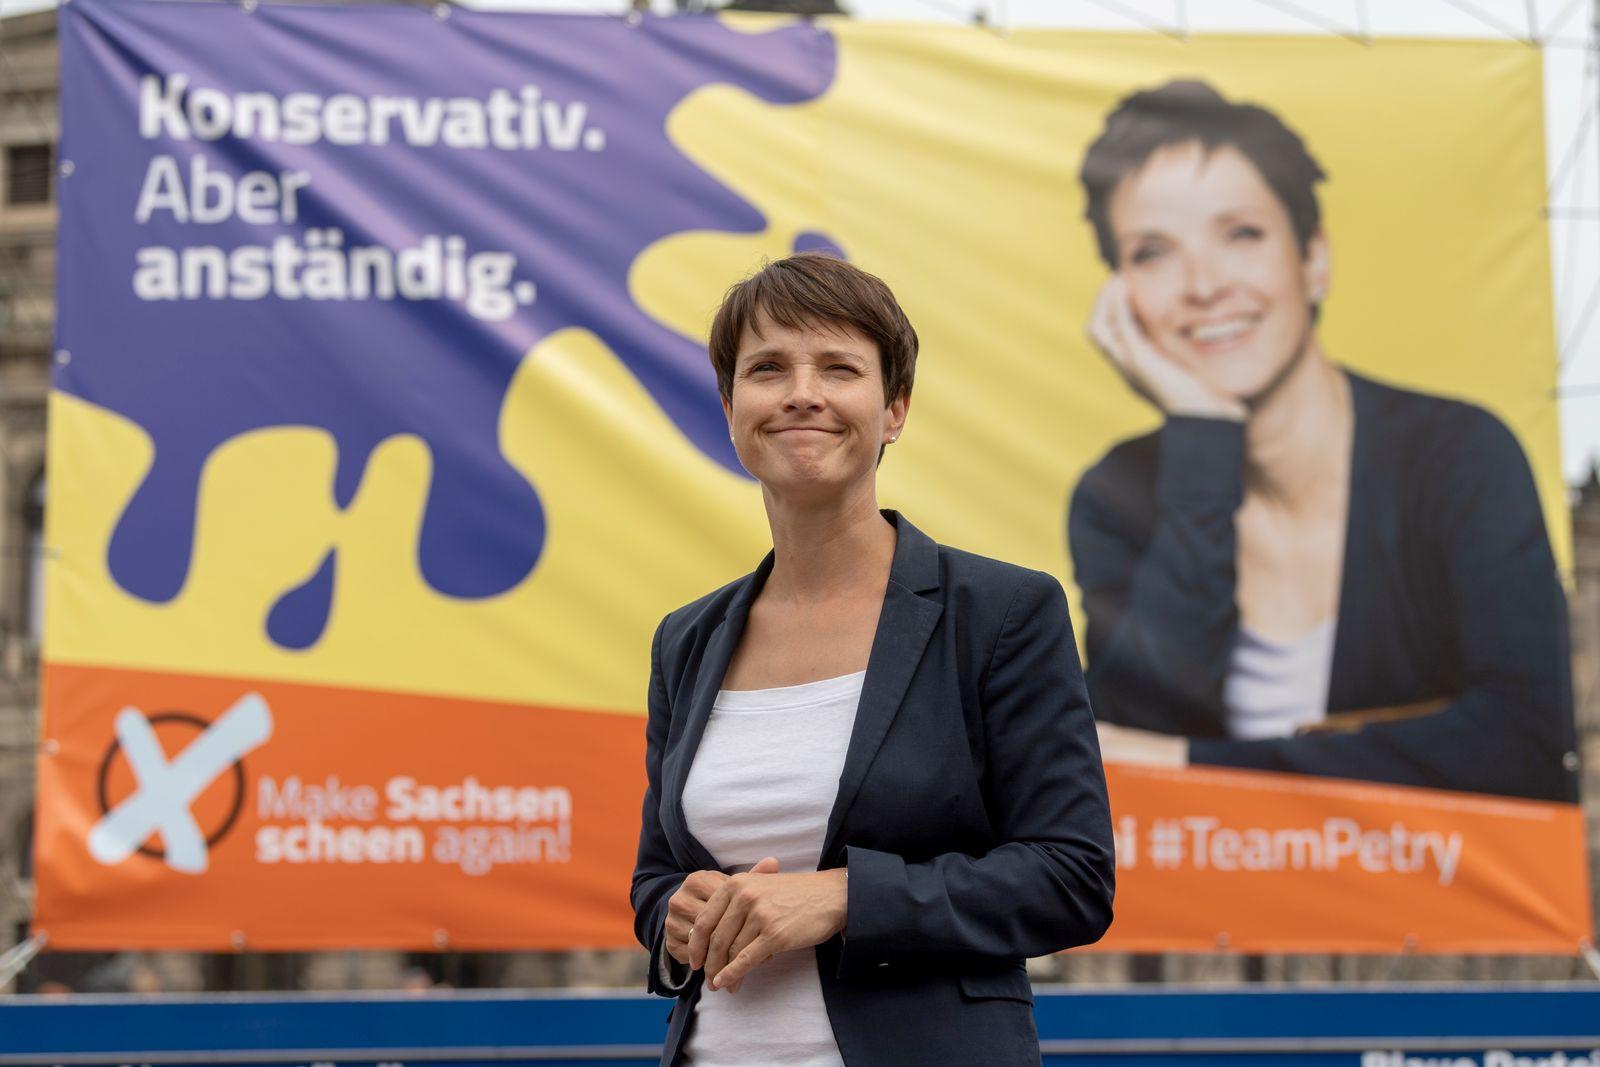 Frauke Petry/ Partei/ Flopp